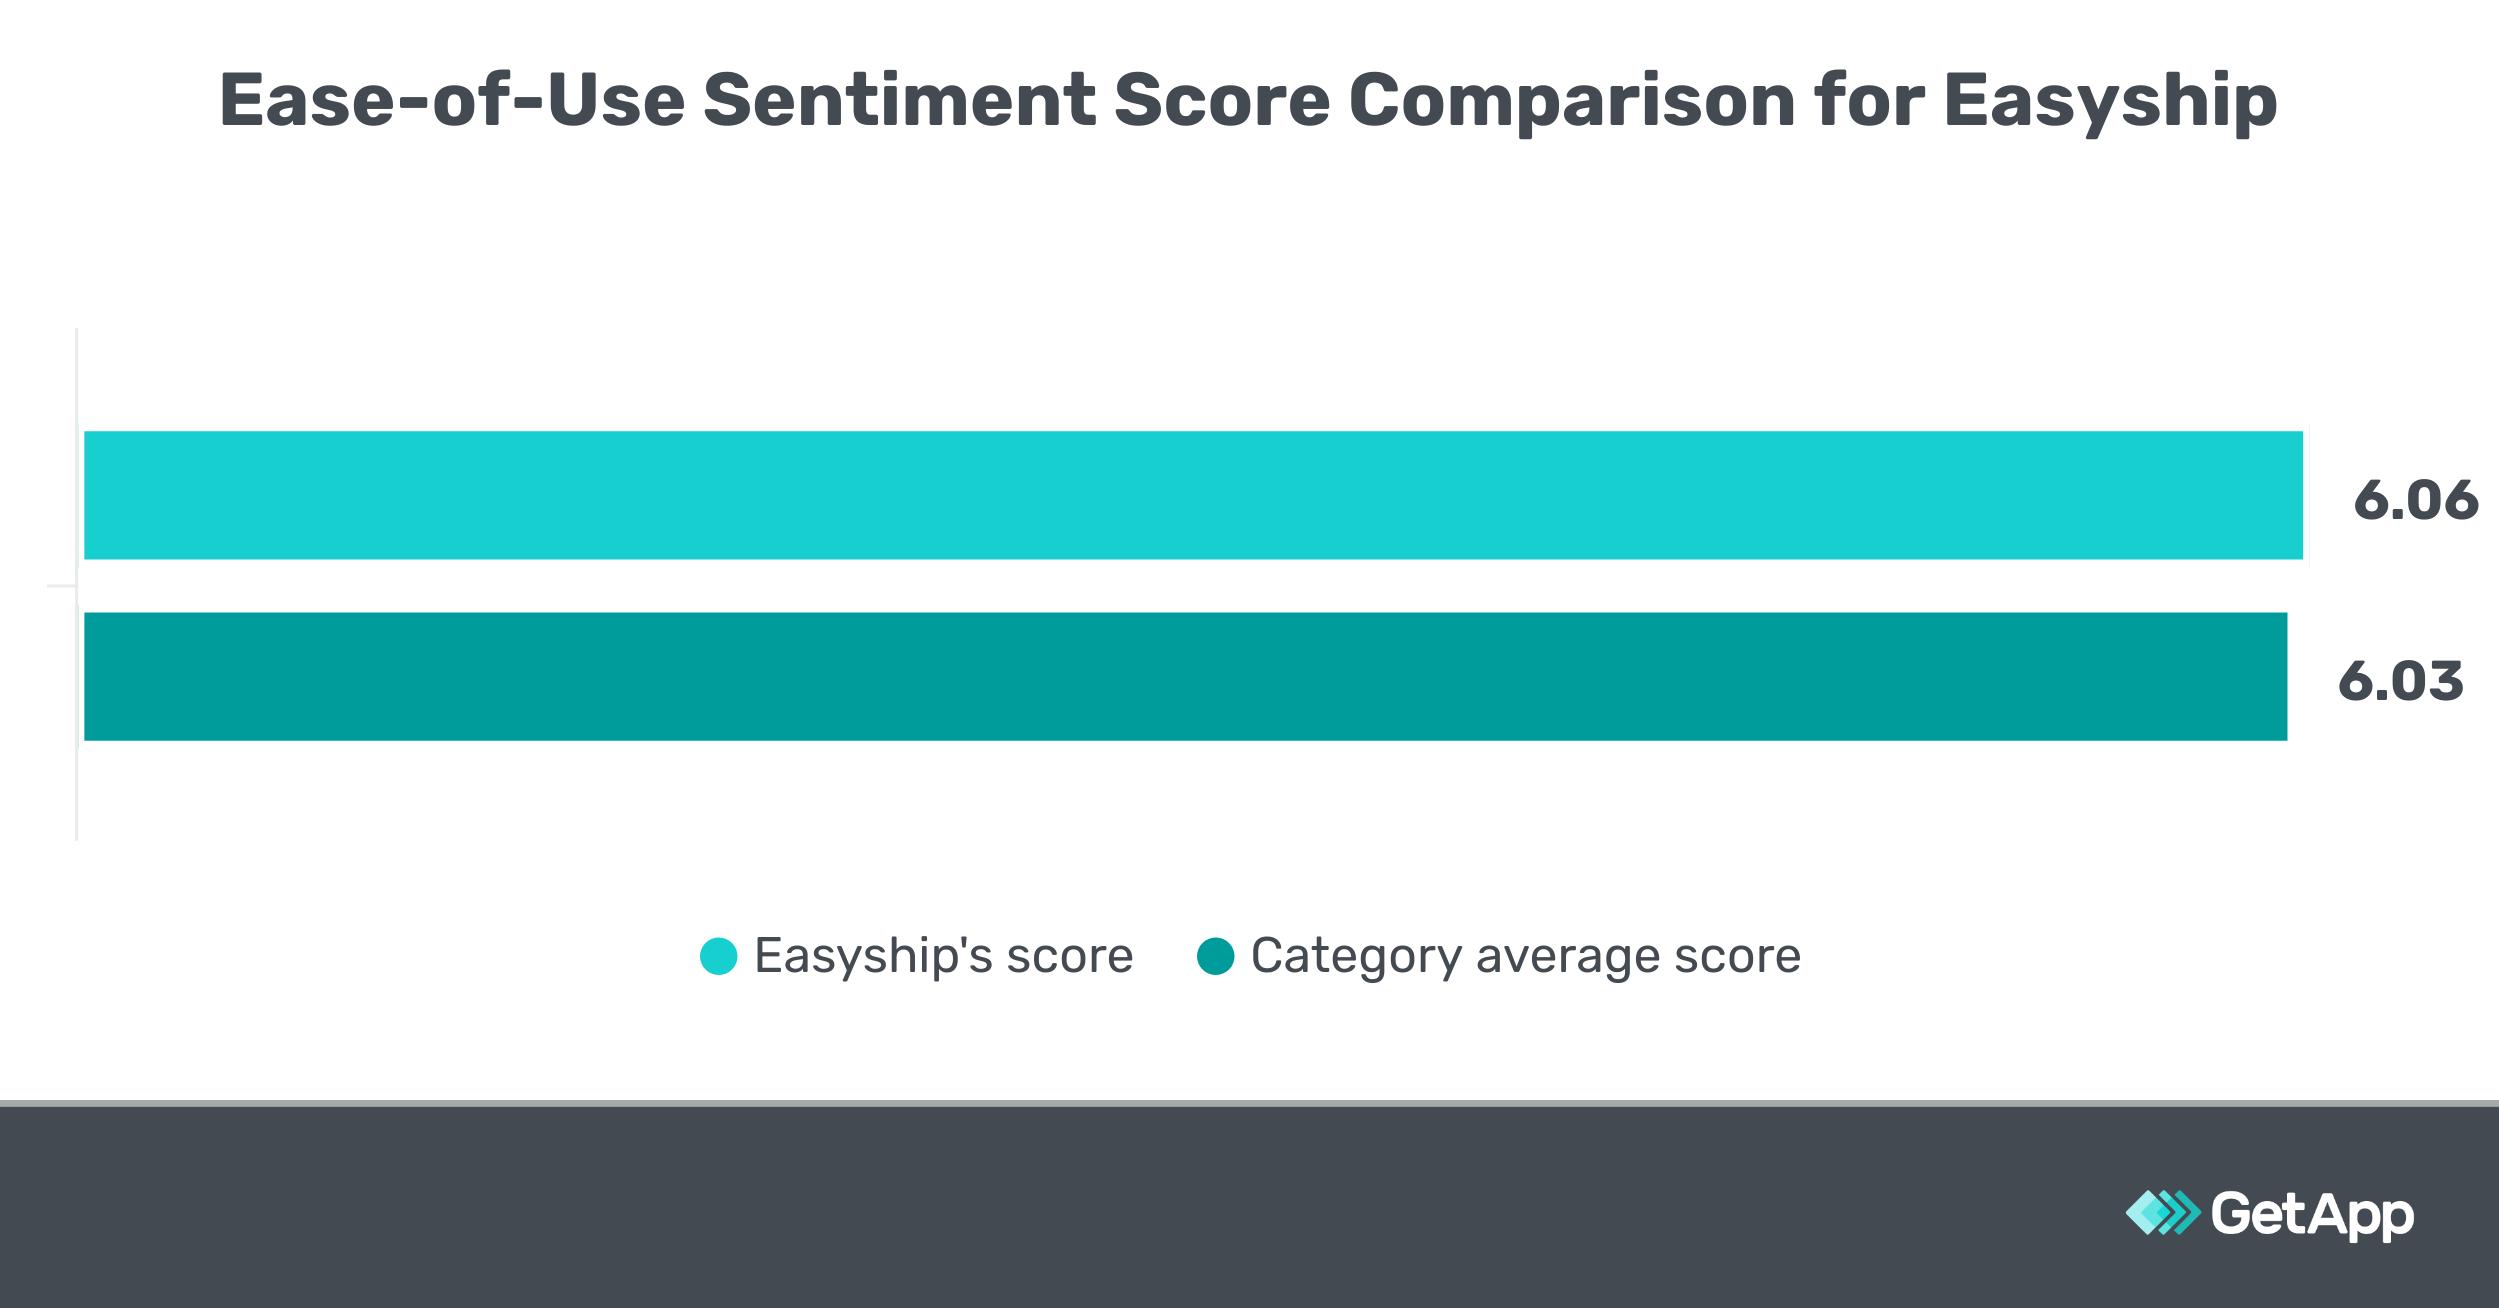 Ease of Use Sentiment Score Comparison for Easyship